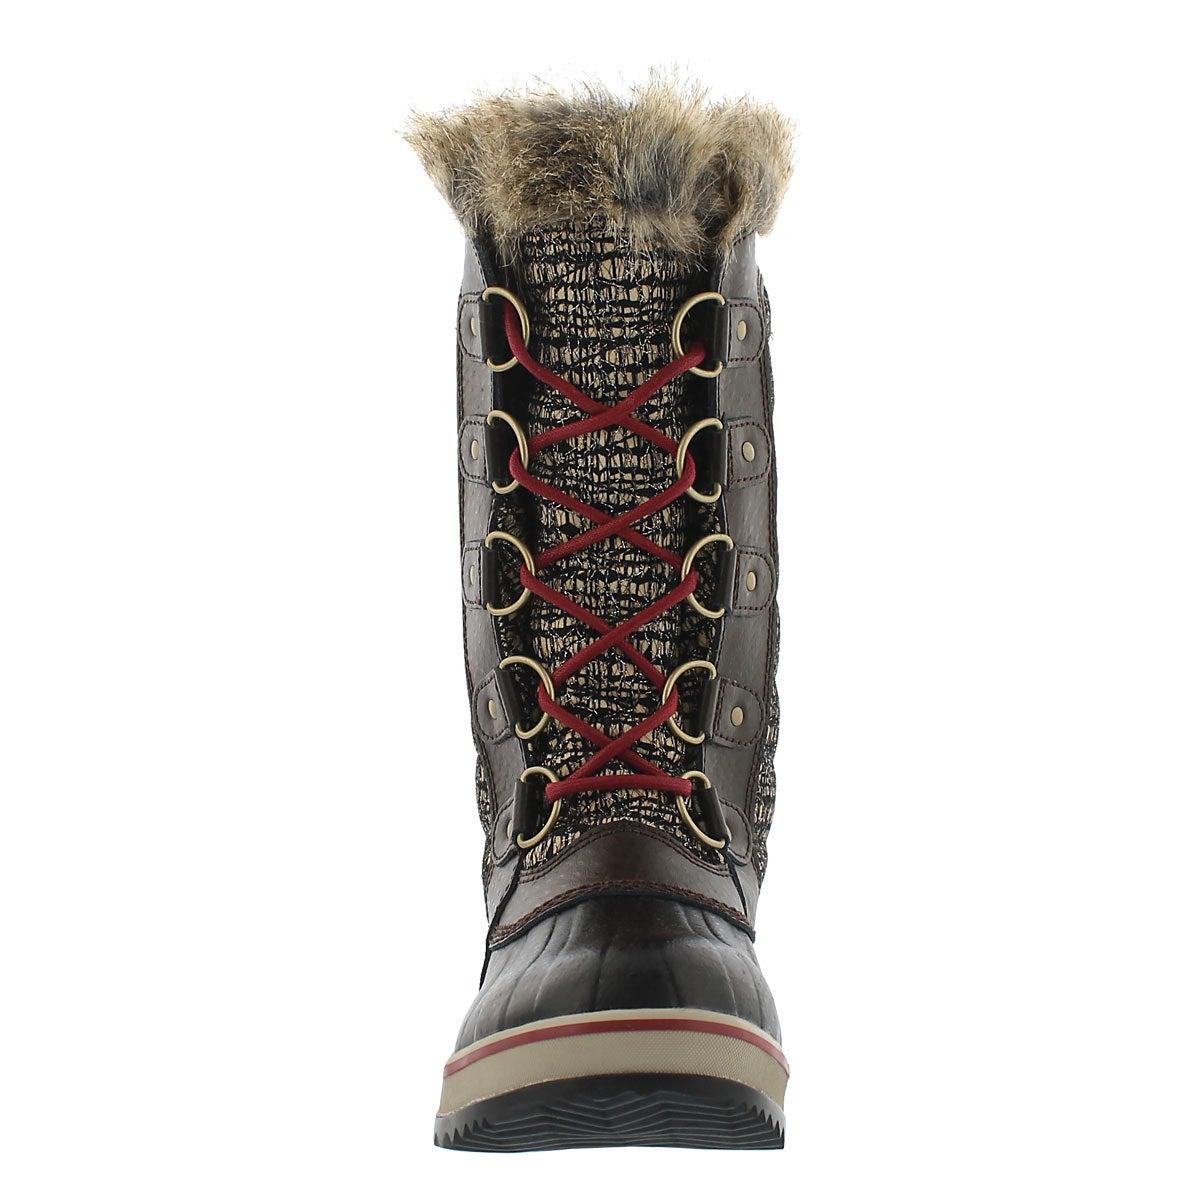 Lds Tofino II cordovan wtpf boot